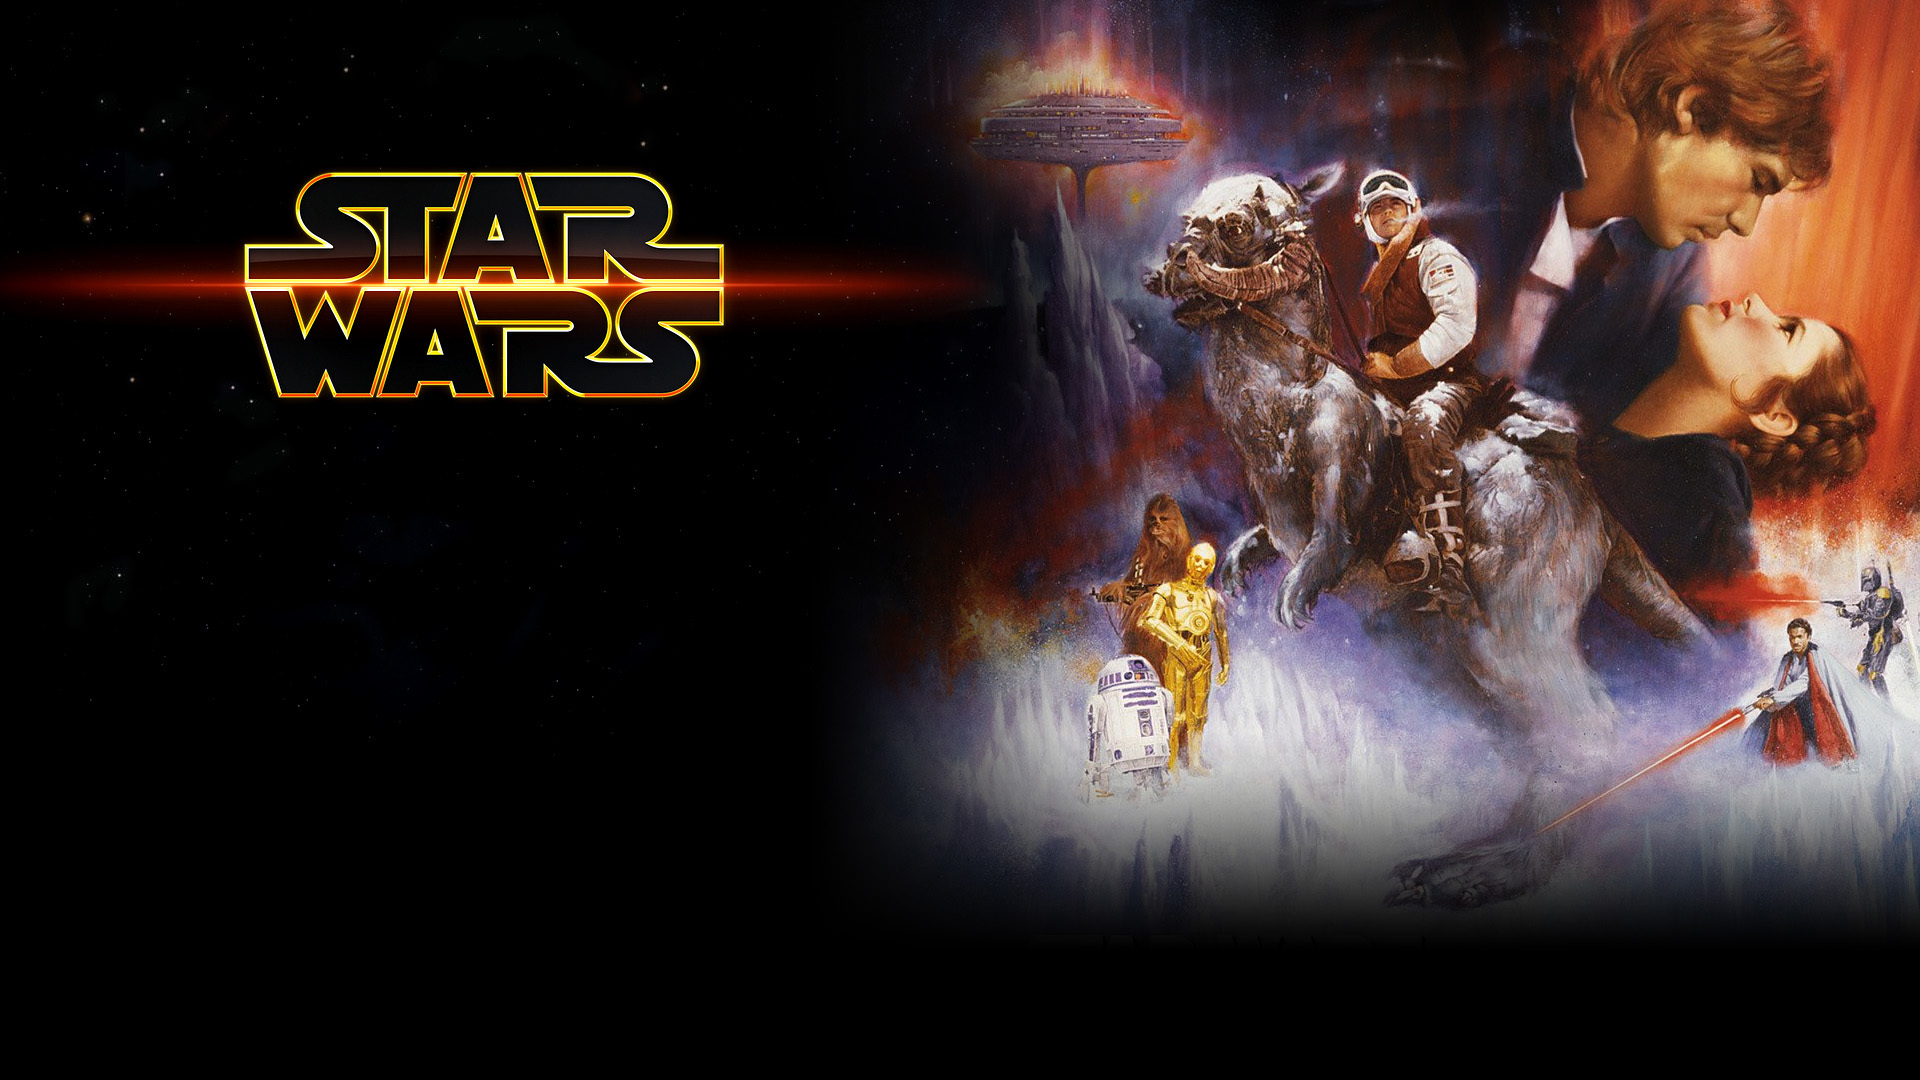 Star Wars Episode V The Empire Strikes Back Hd Wallpaper Background Image 1920x1080